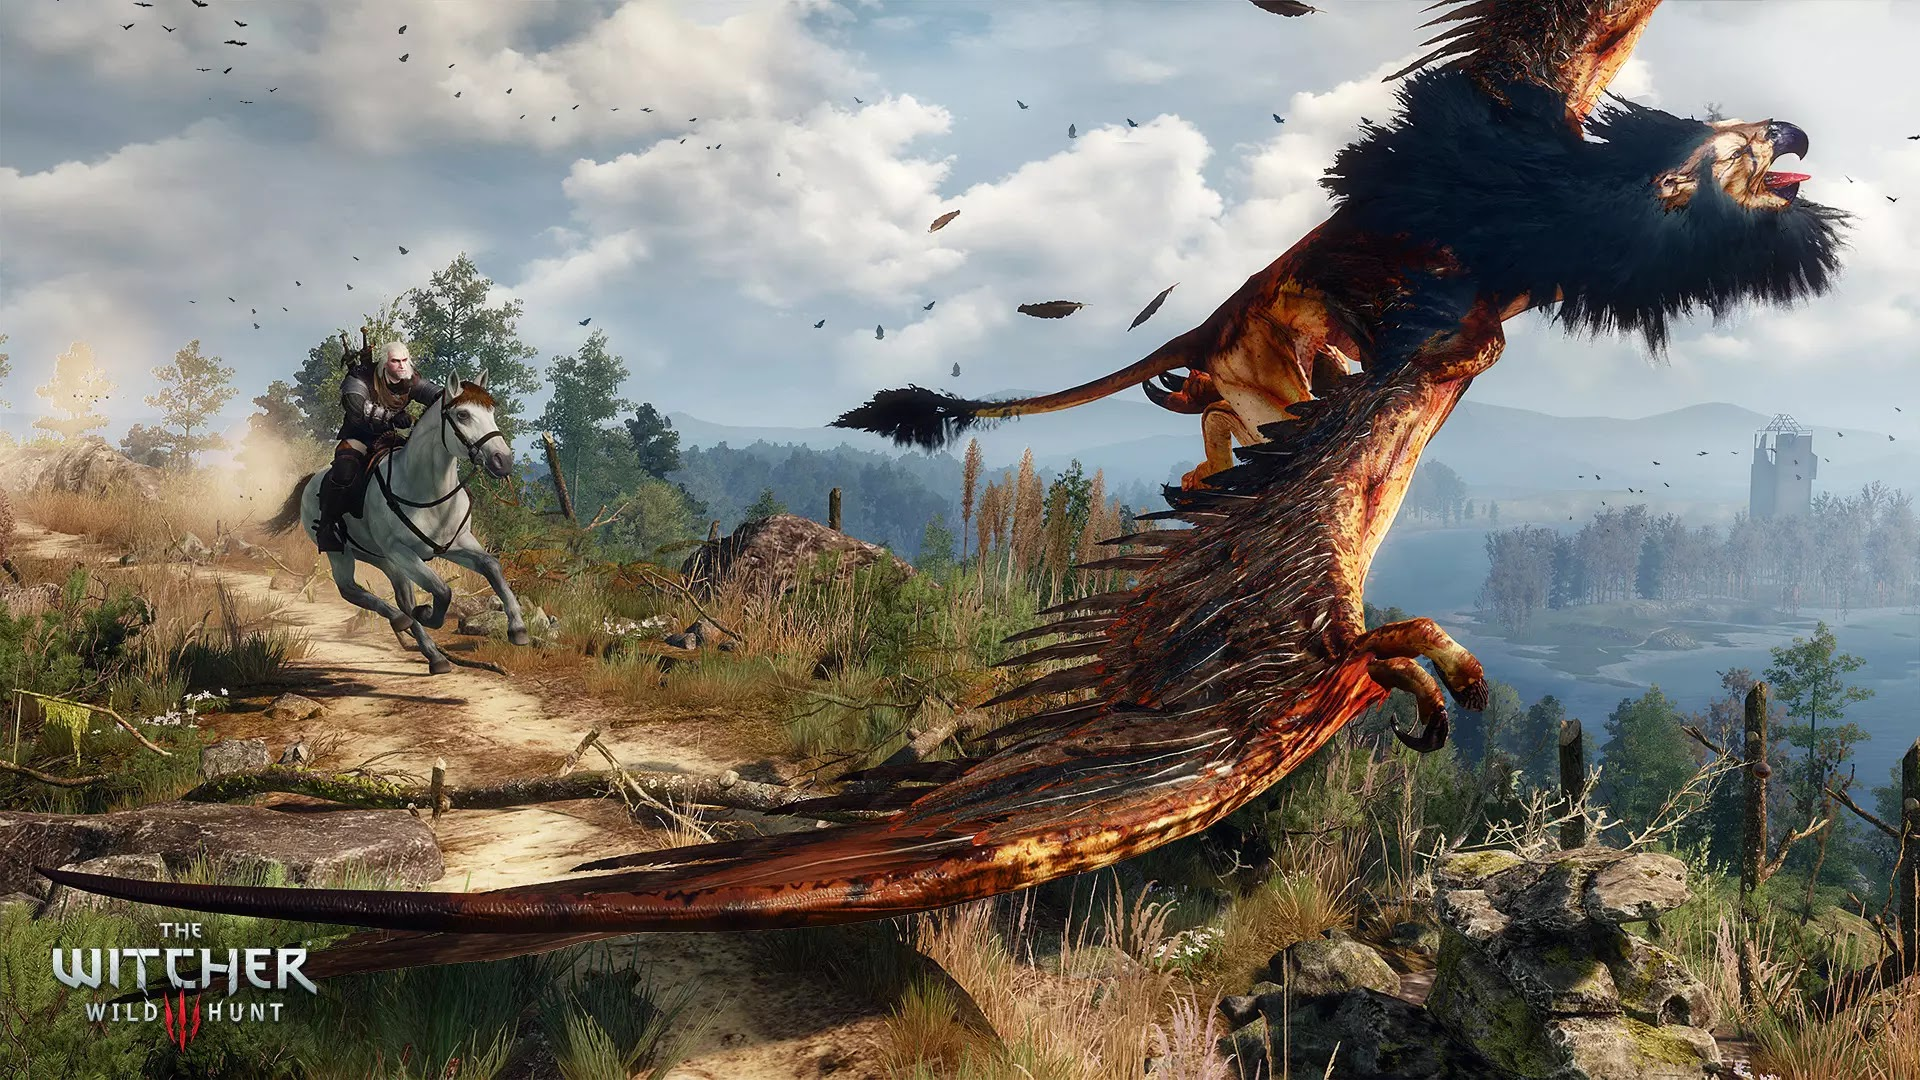 Main Image Upgrade Next-Gen The Witcher 3 Akan Terjadi Tahun Ini